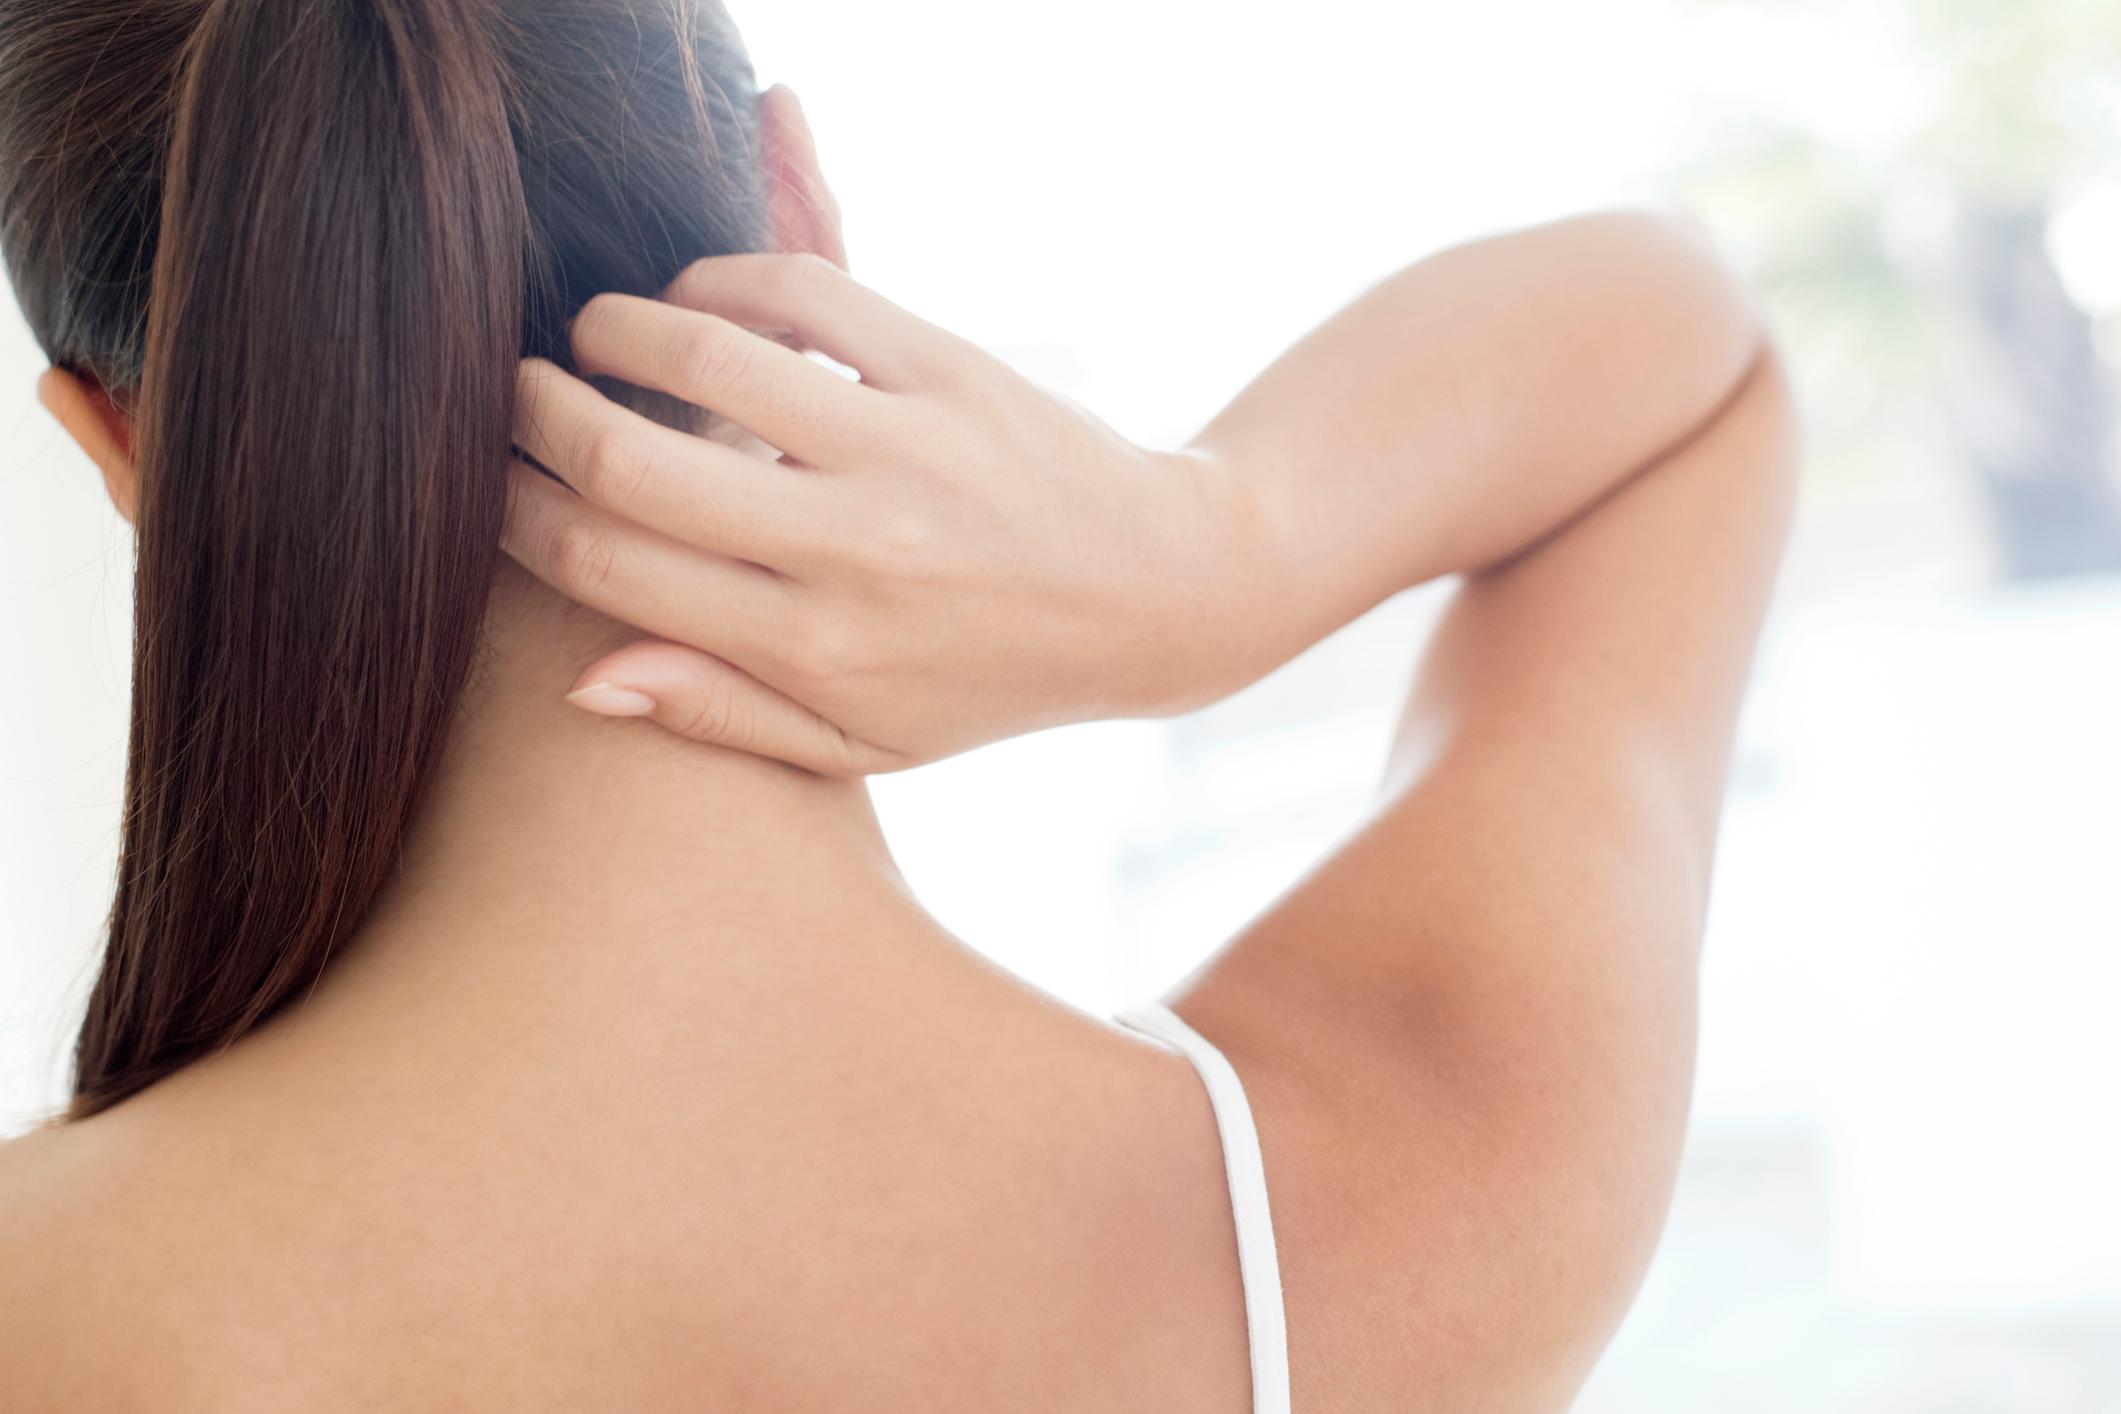 hogyan lehet otthoni fejbőr pikkelysömör gyógyítani